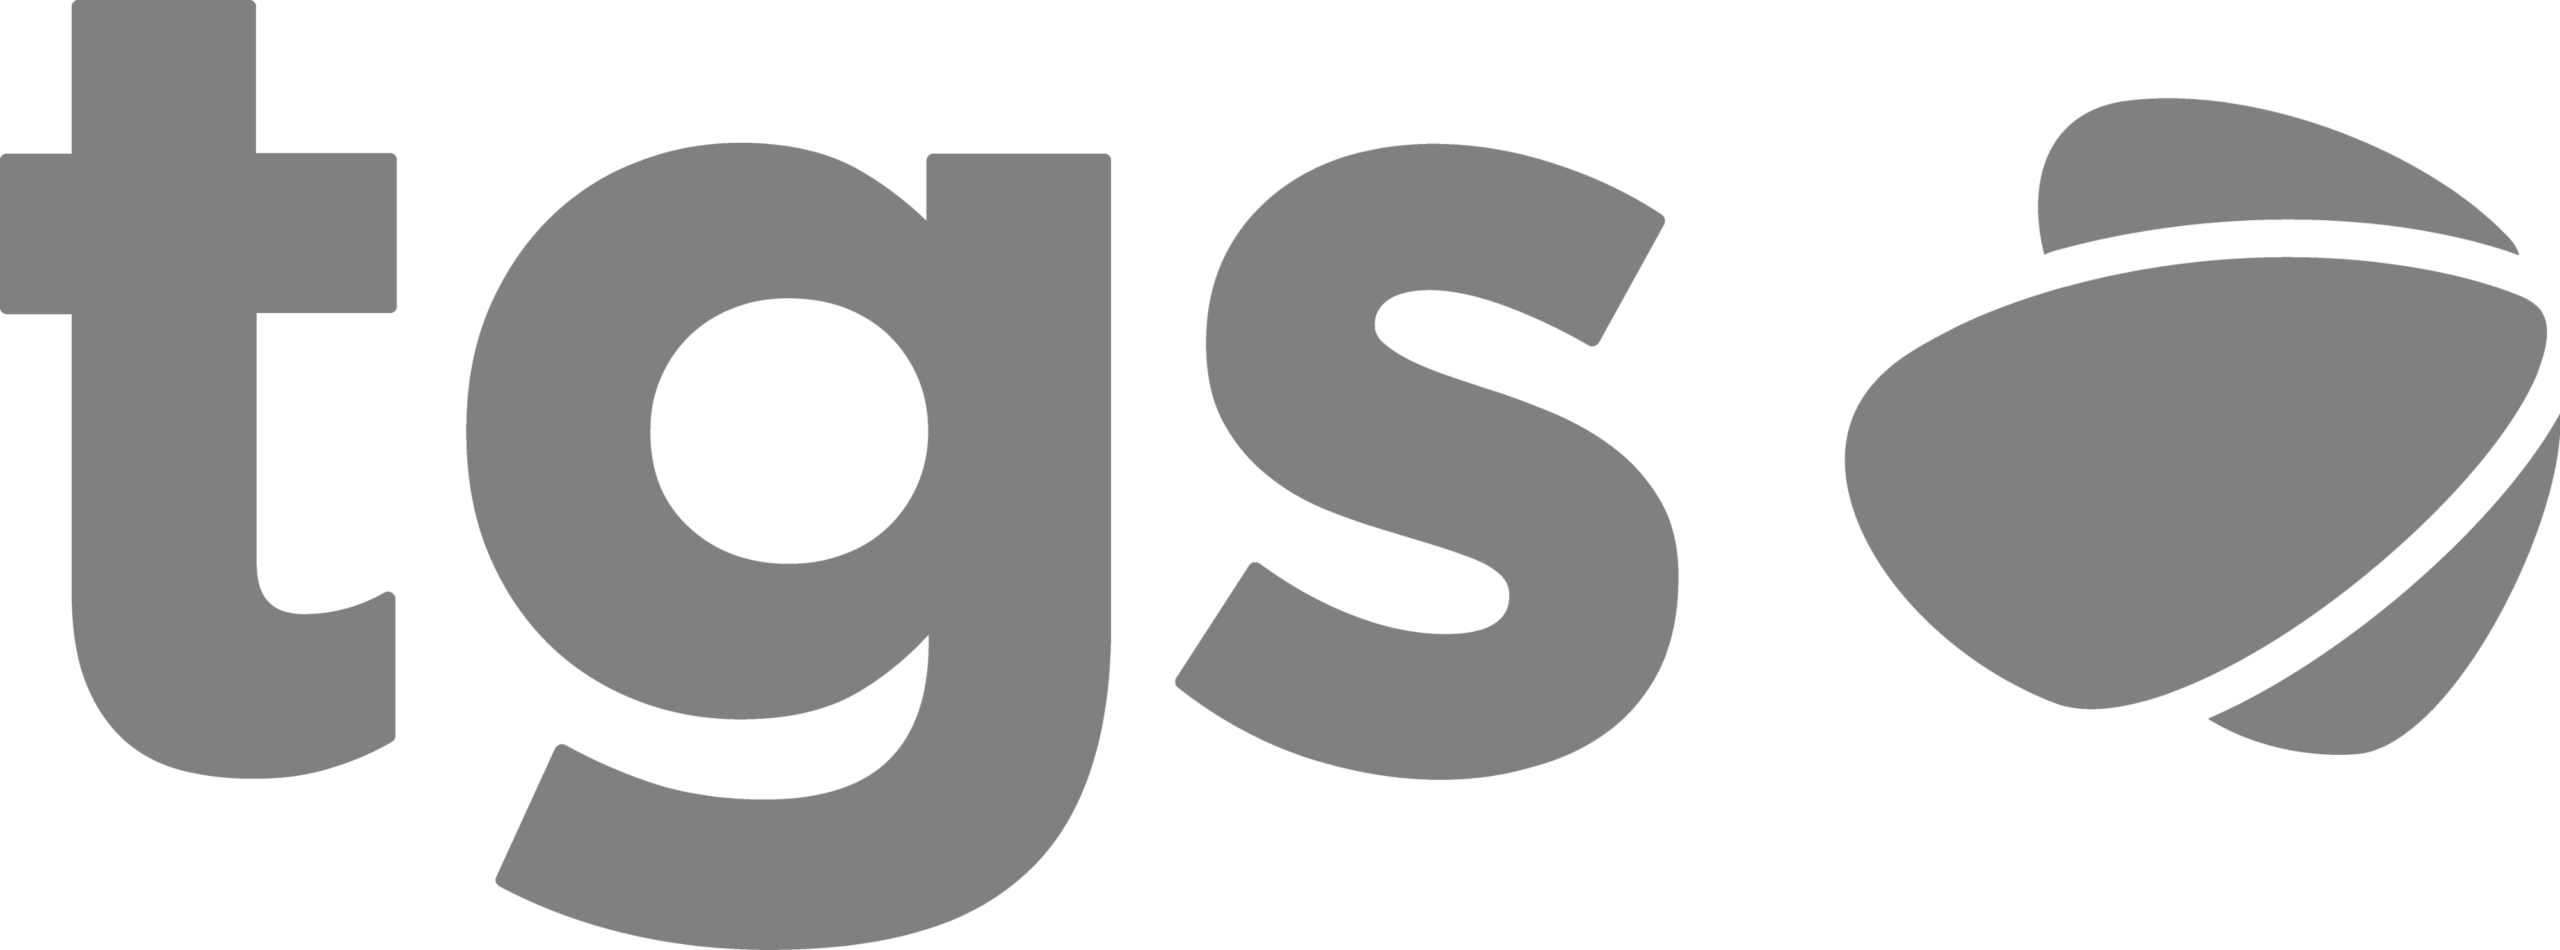 tgs-new